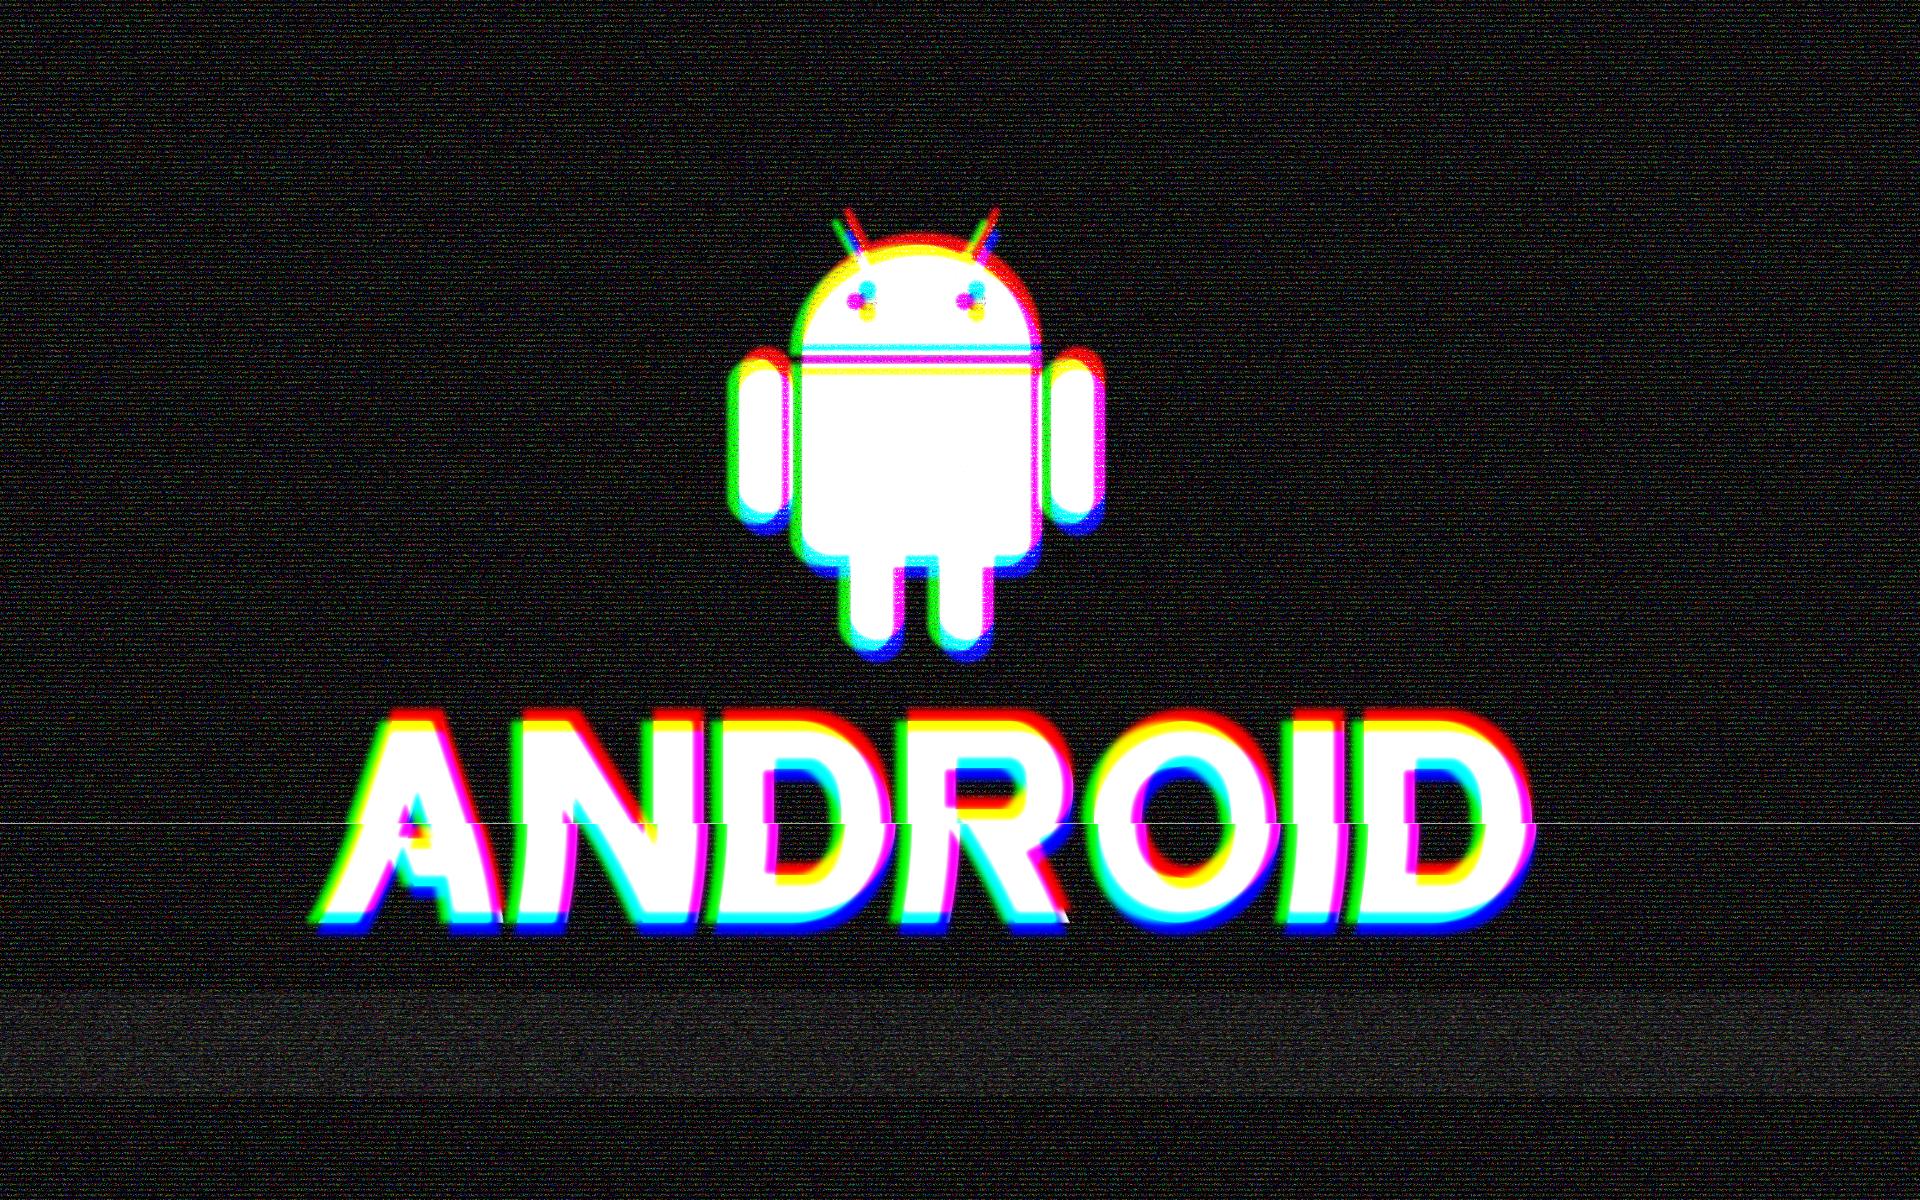 Картинки с надписями на андроид